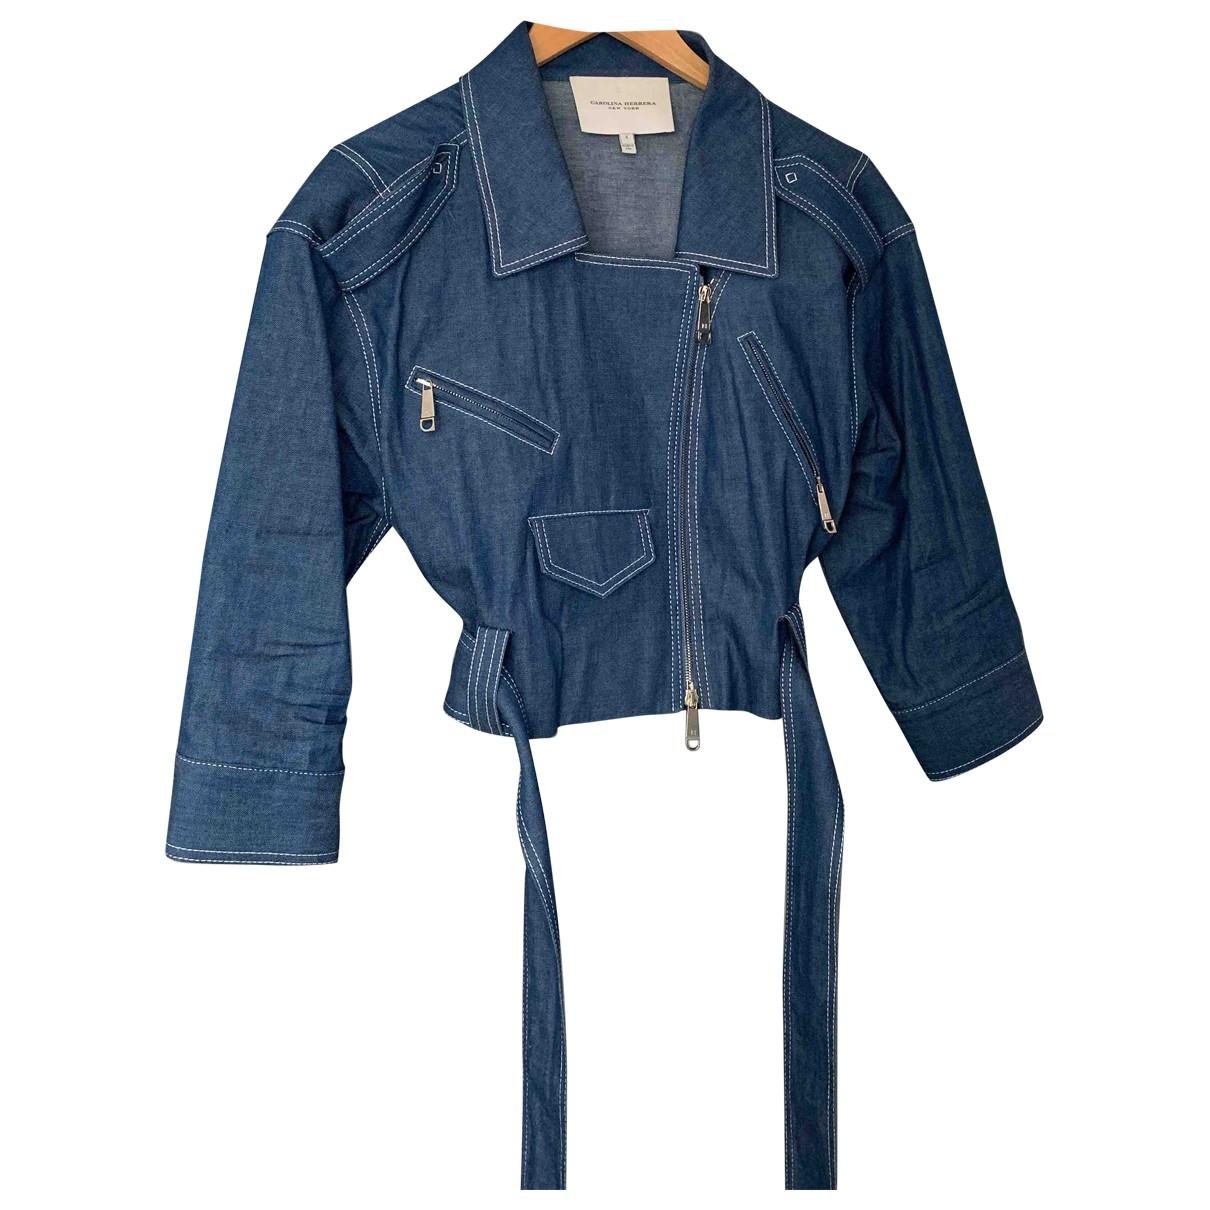 Carolina Herrera \N Blue Denim - Jeans jacket for Women 4 US